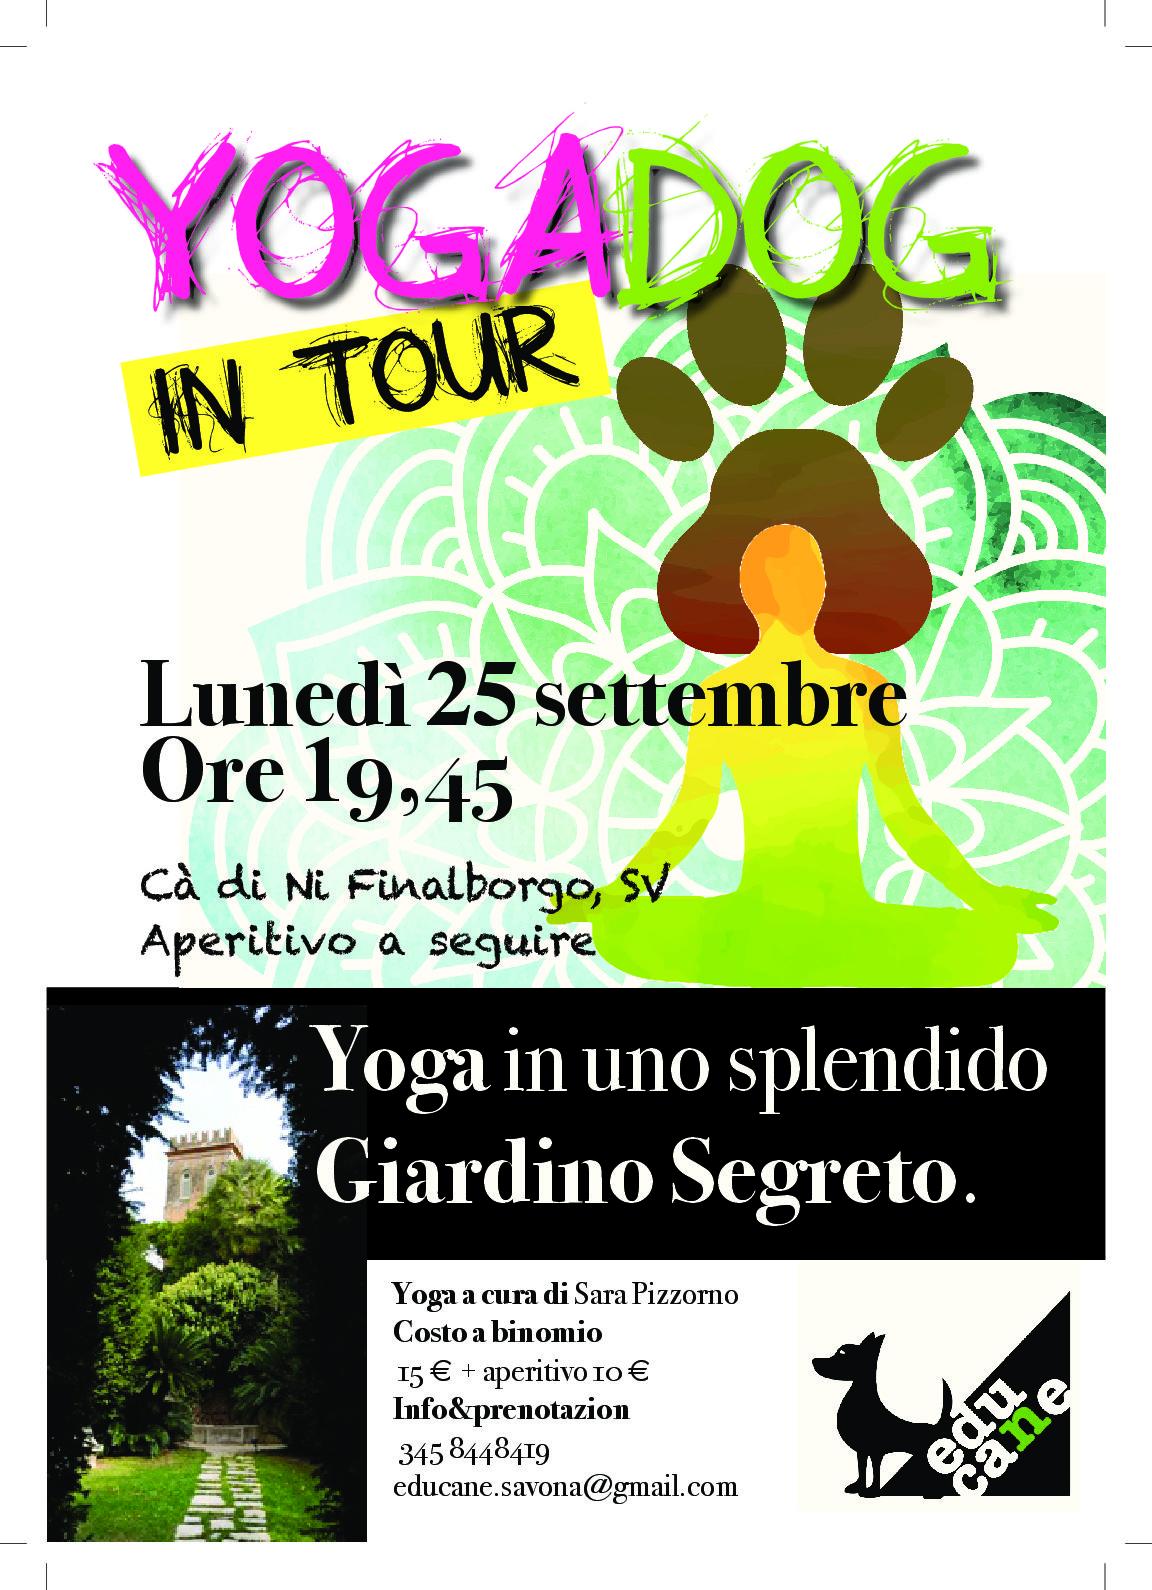 Yogadog nel nostro giardino segreto residence ca di n finalborgo finale ligure - Il giardino segreto pdf ...